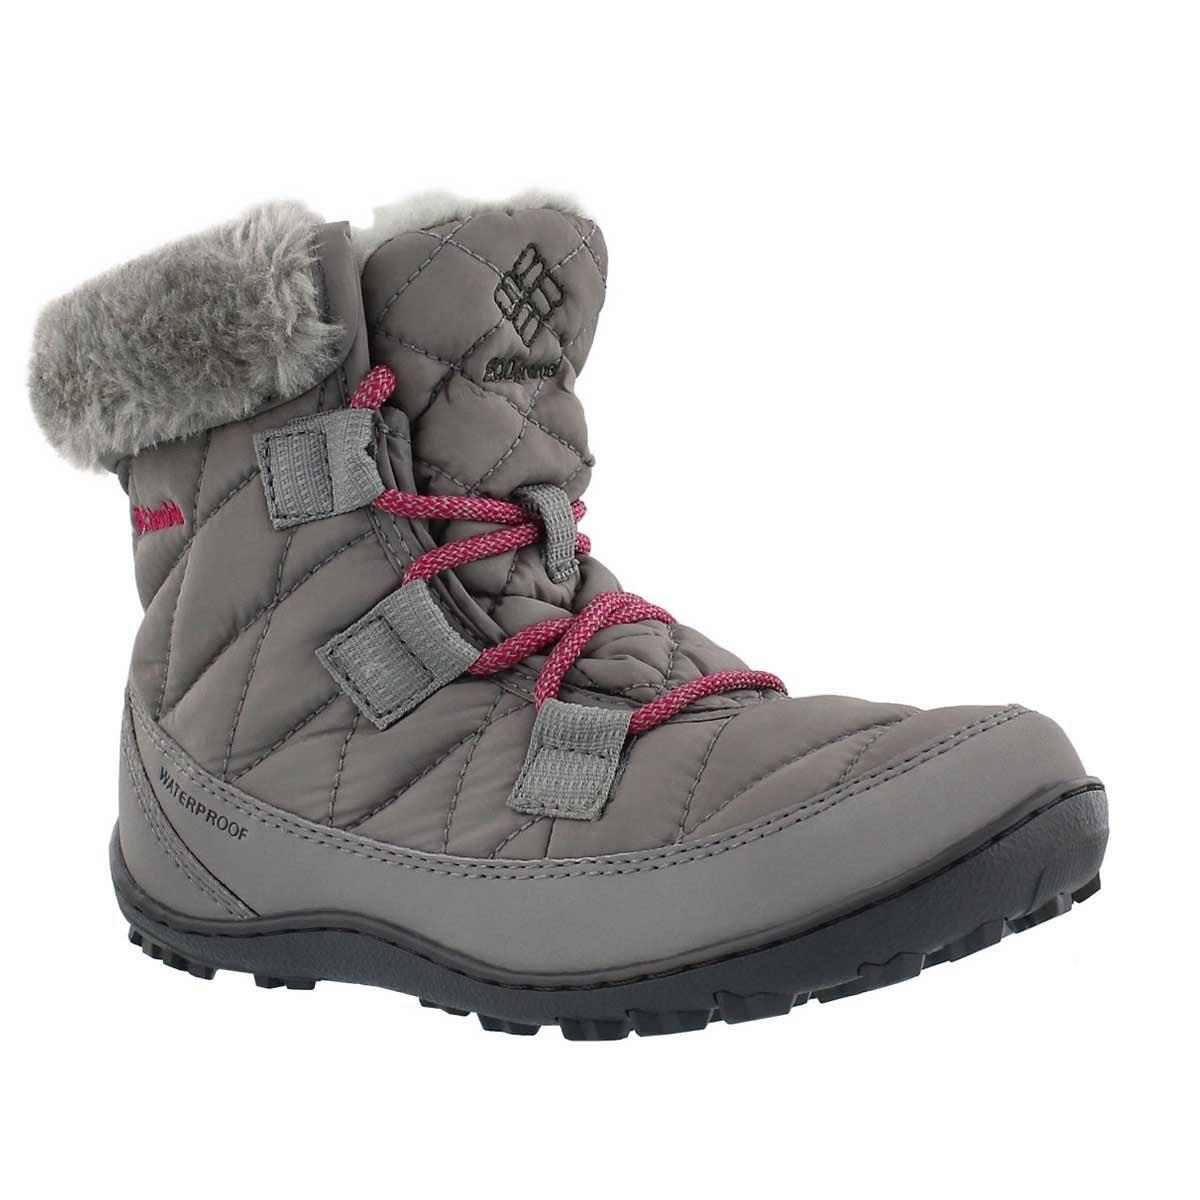 Girls' MINX SHORTY grey winter boots